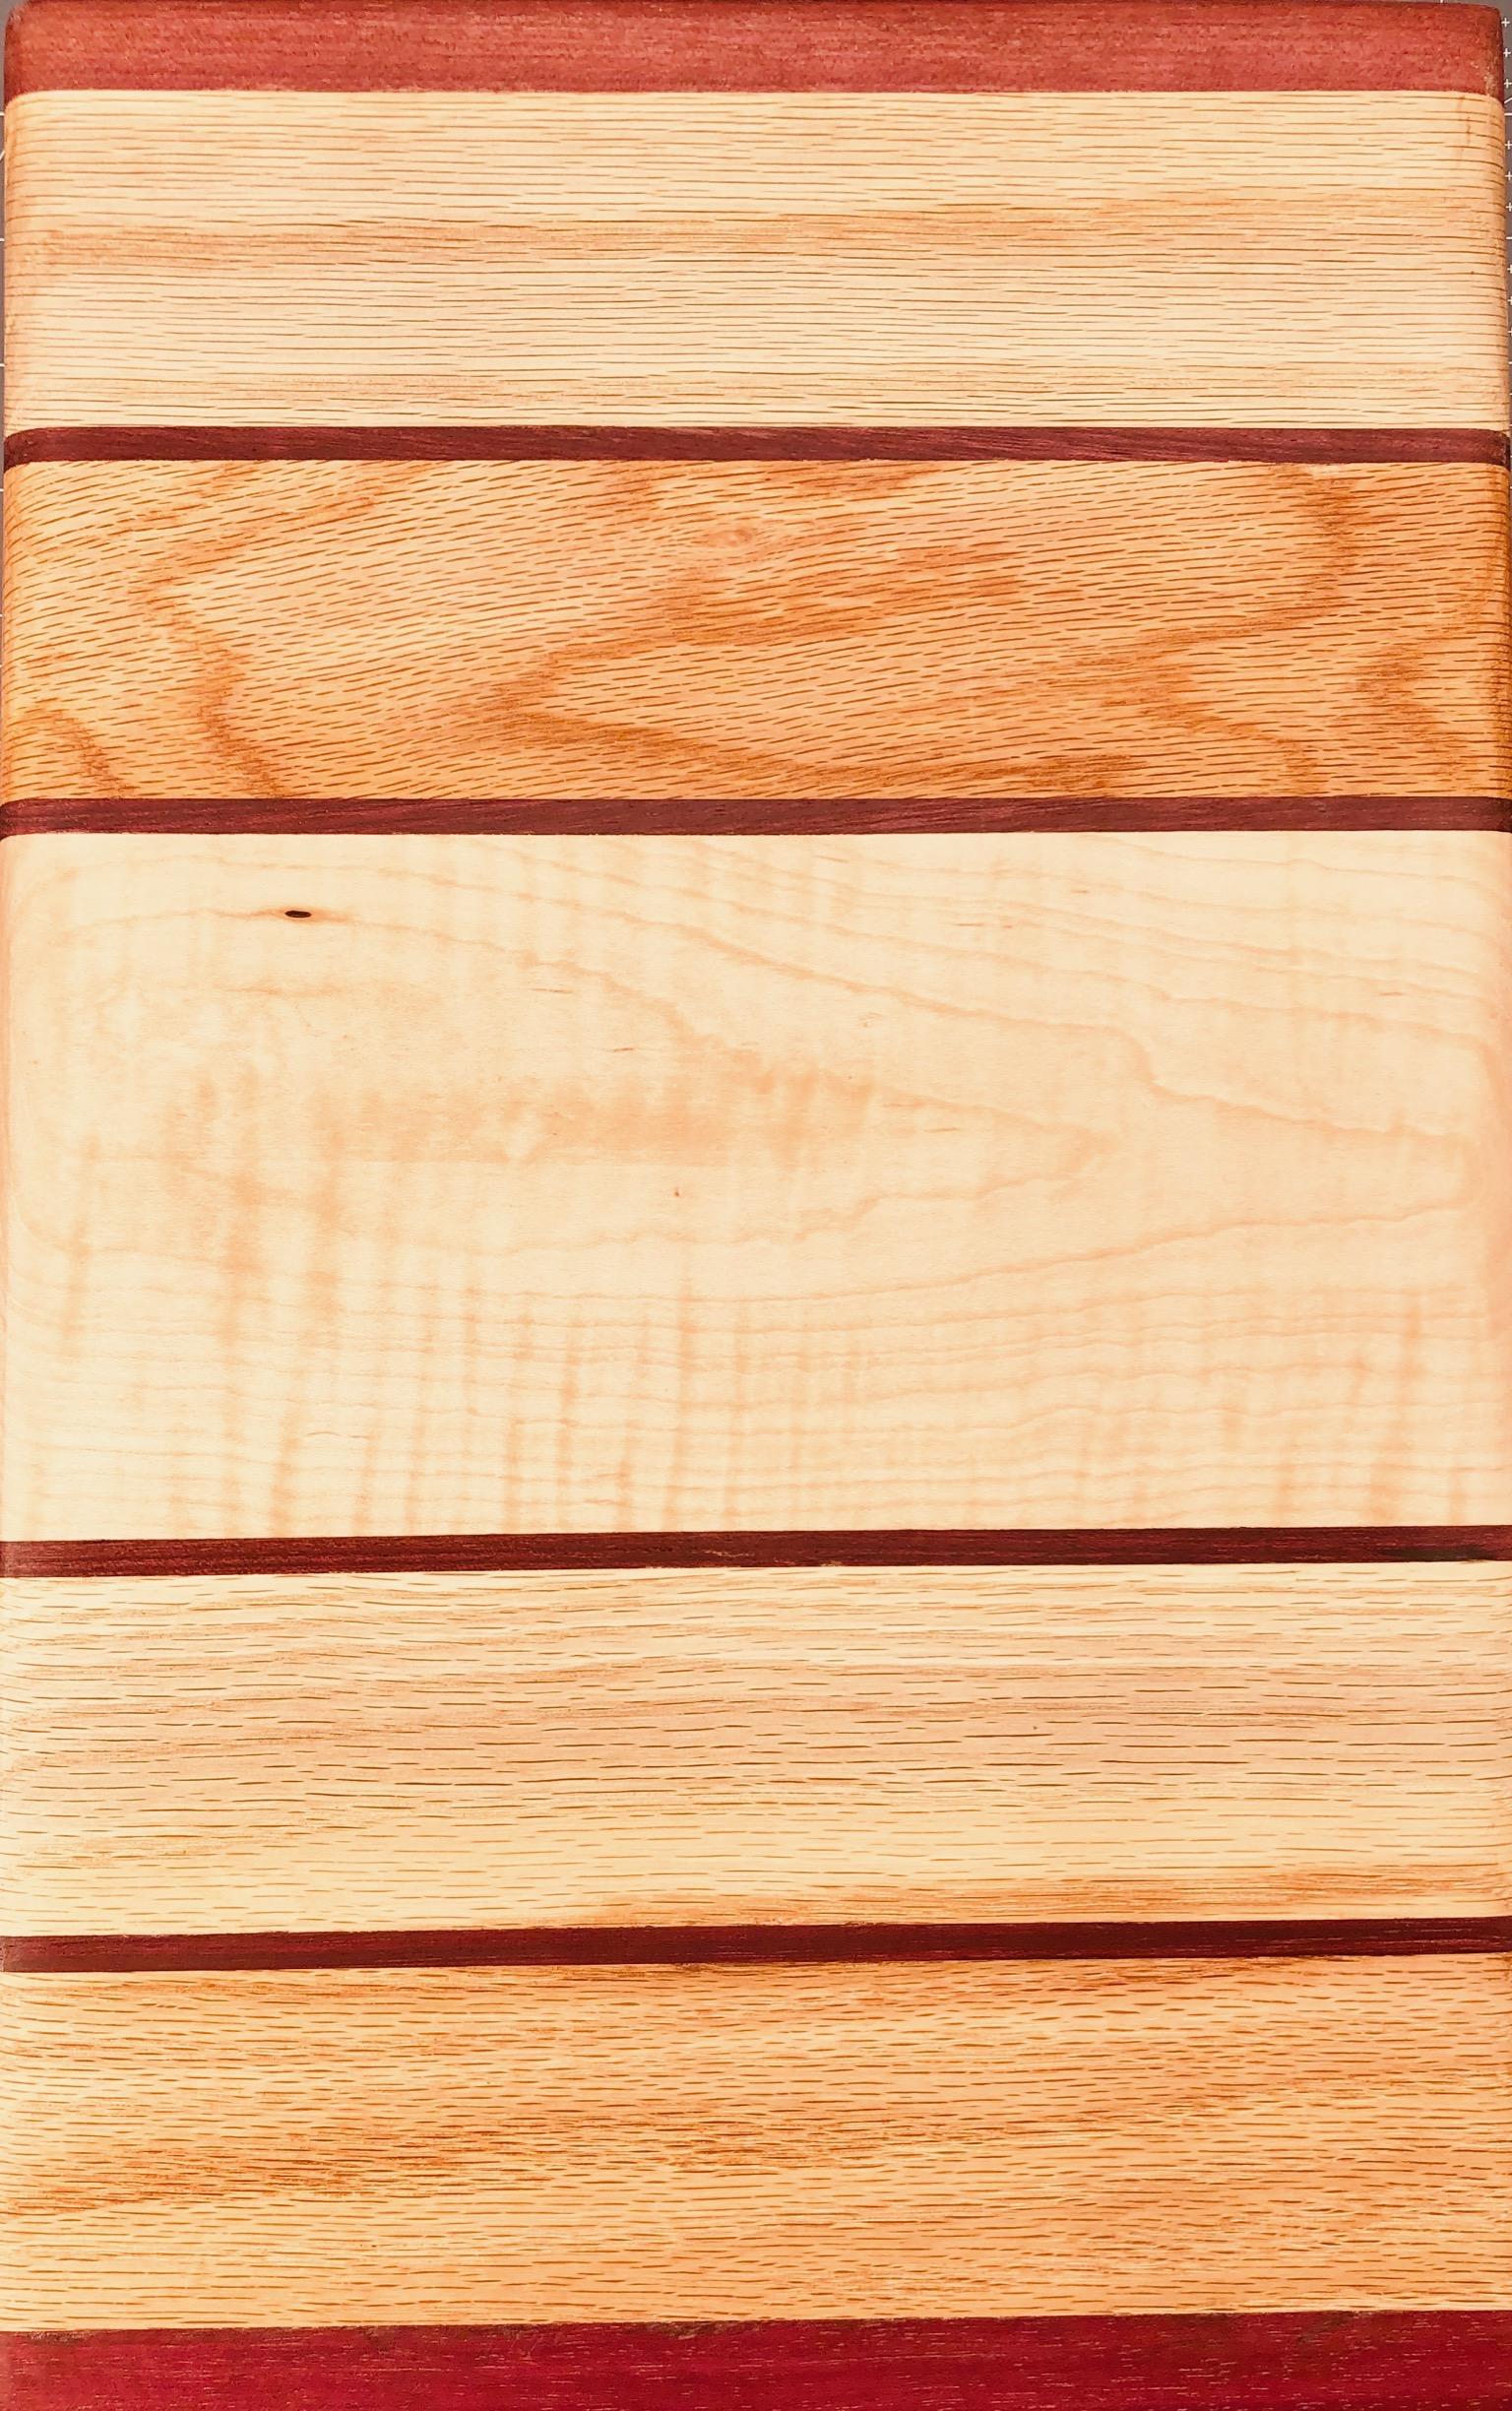 Oak, maple, andpurpleheart cutting board—$75 - 10 x 14 x 1.25 inches